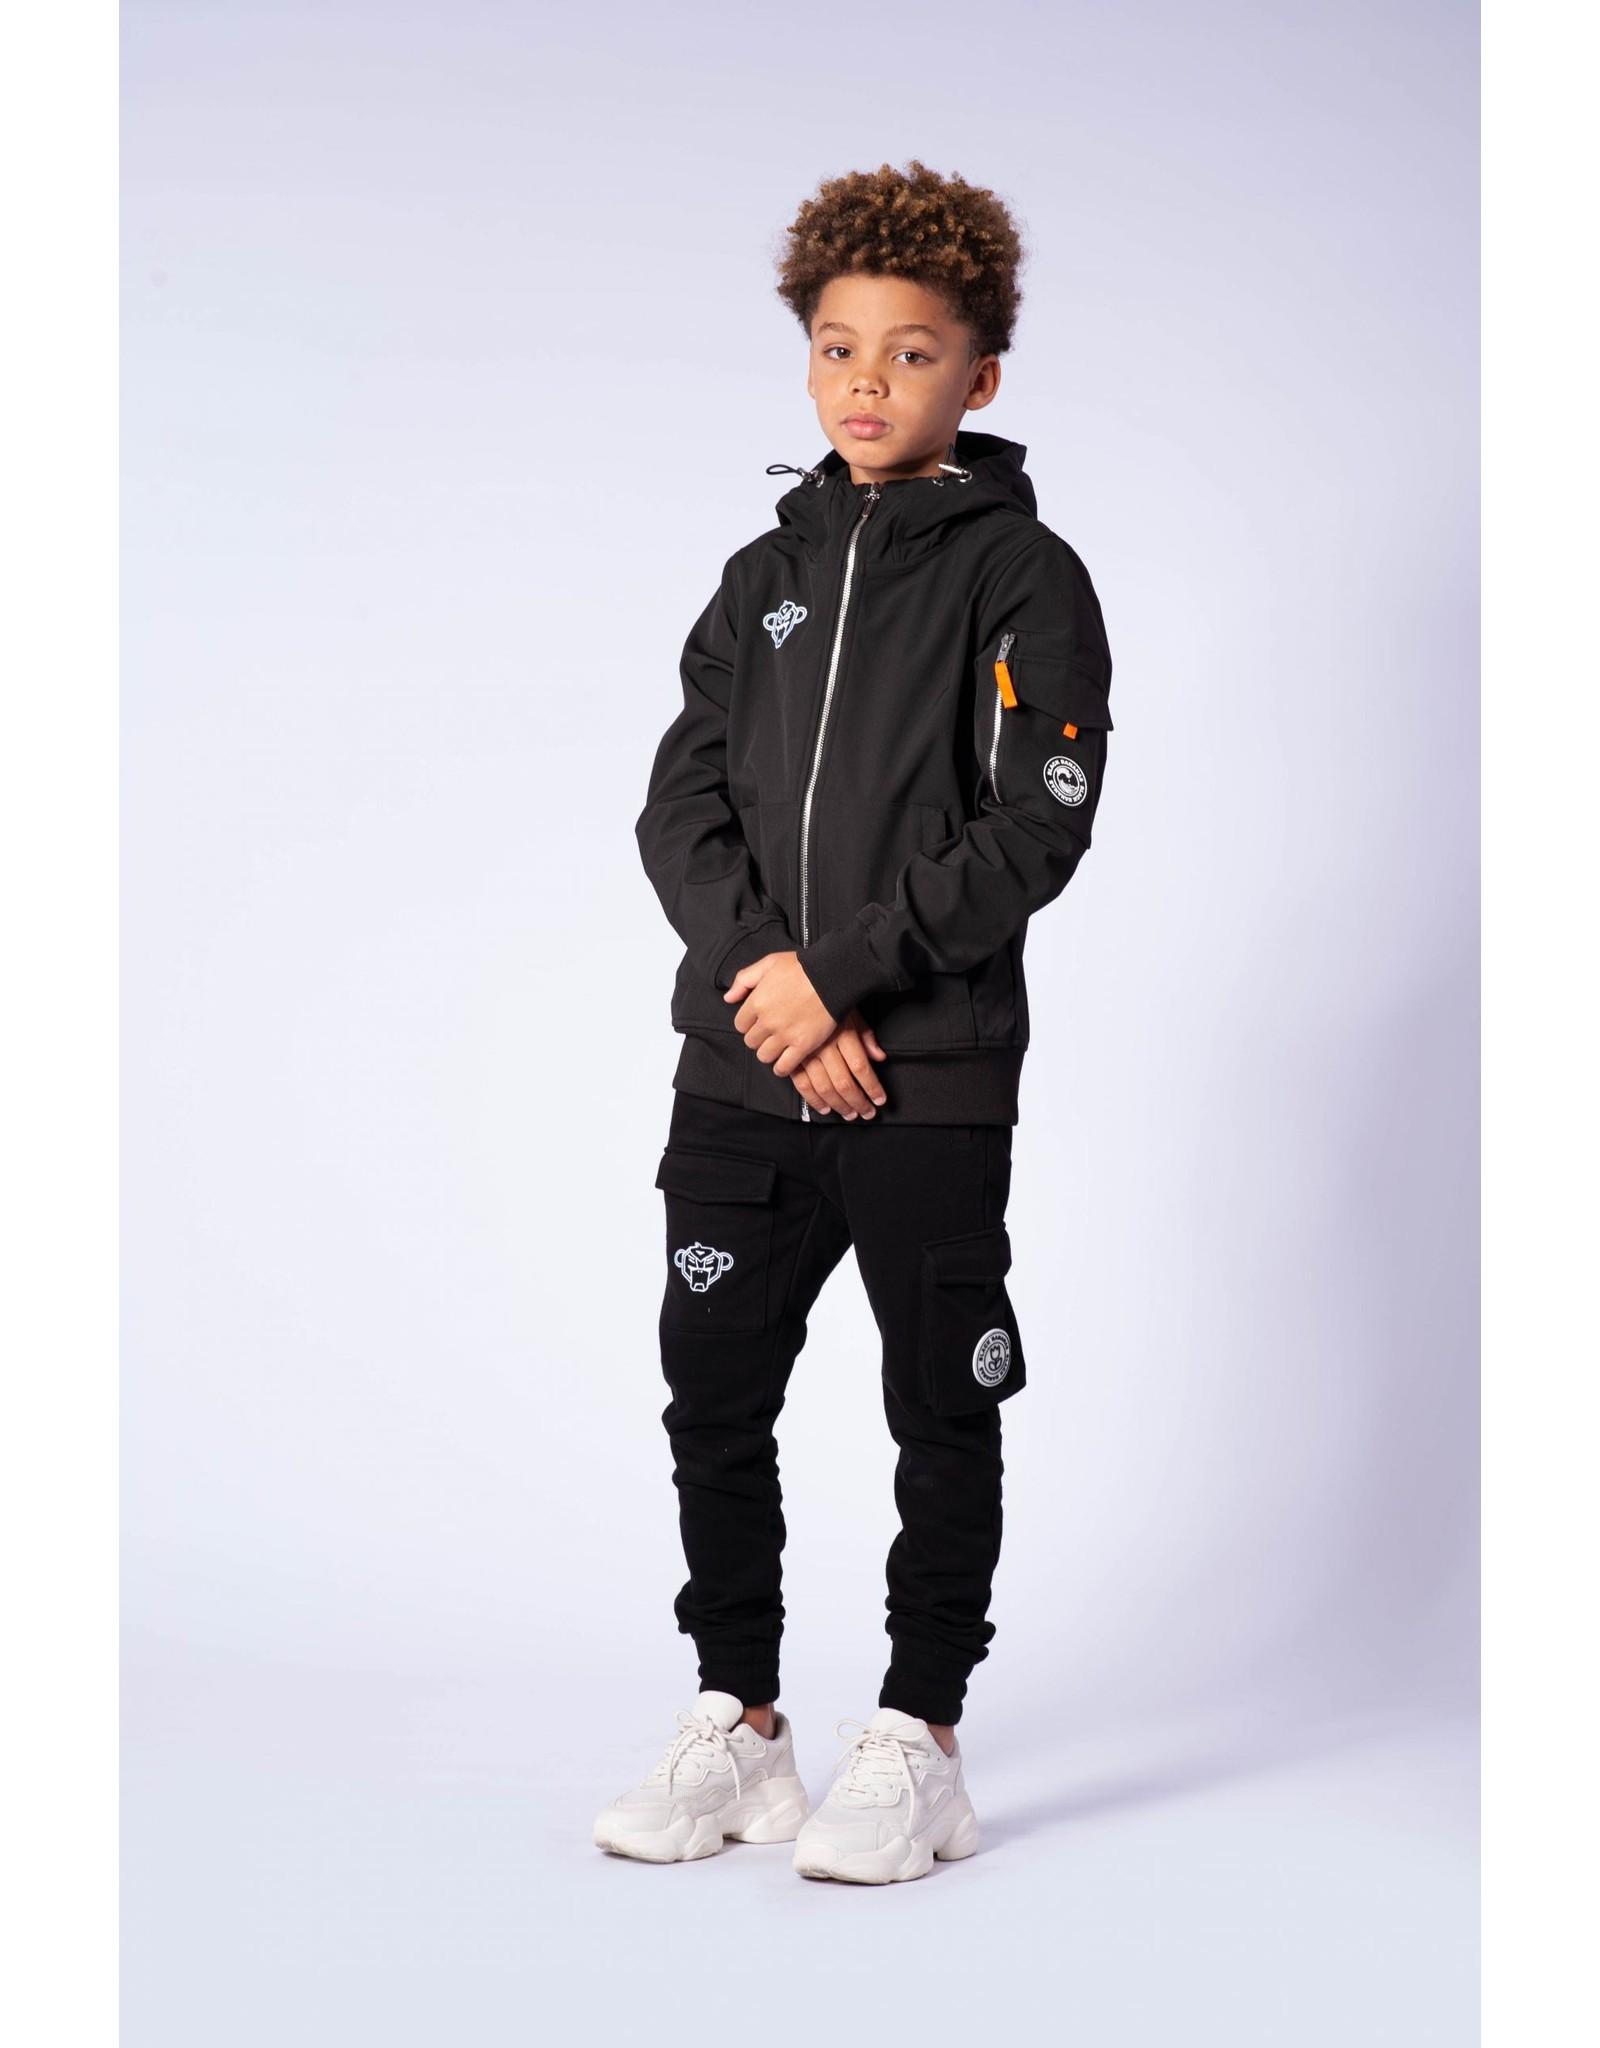 Black Bananas Jr. Softshell Jacket Black